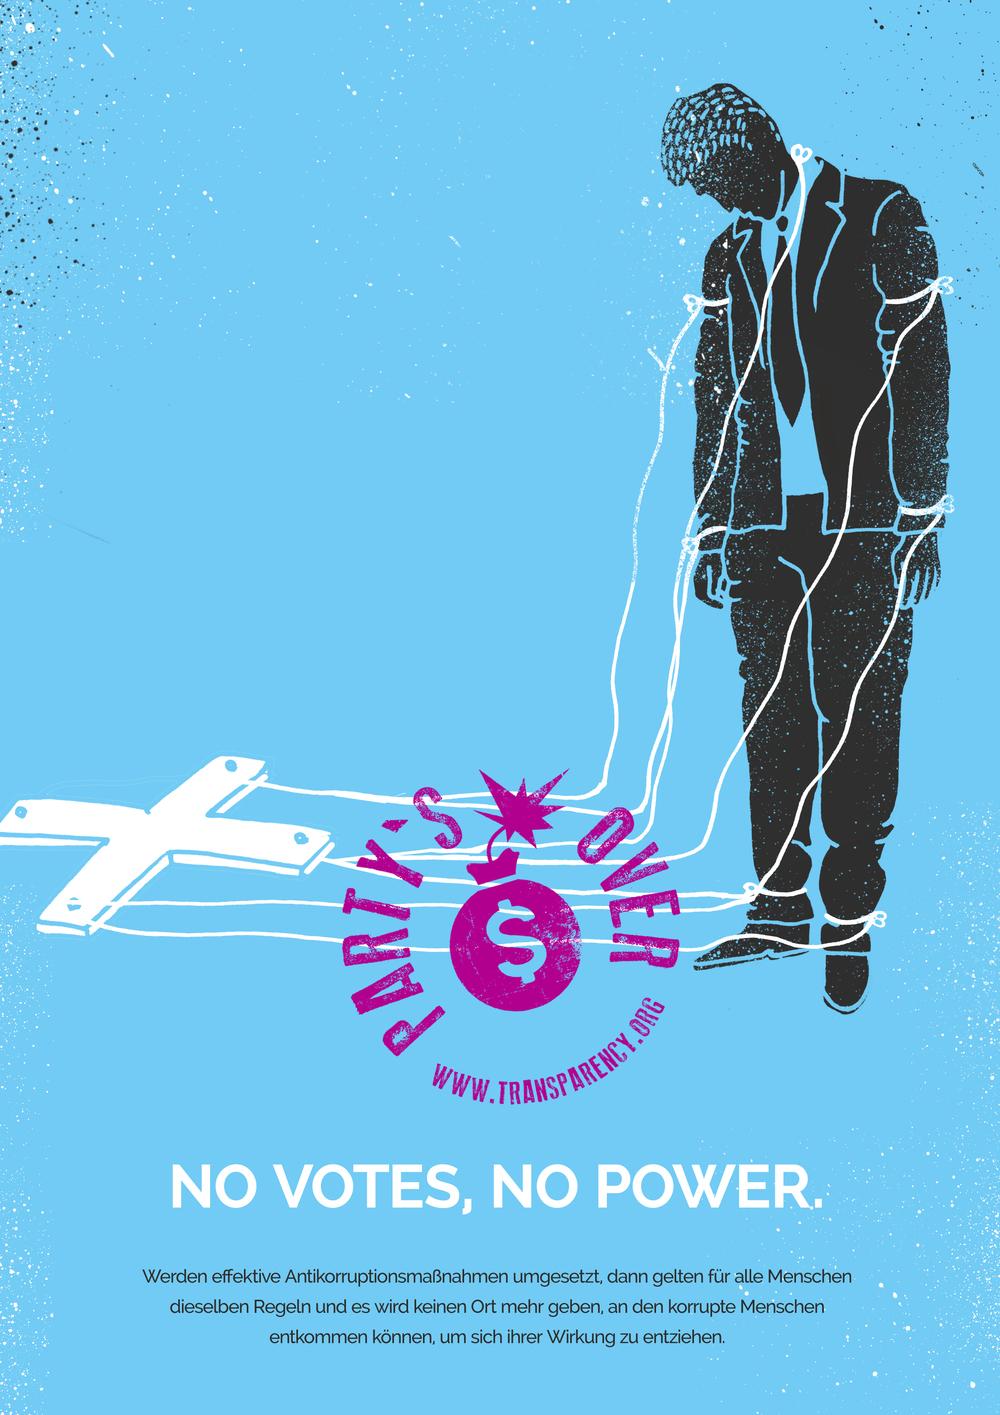 Transparency international poster blau003 bigger